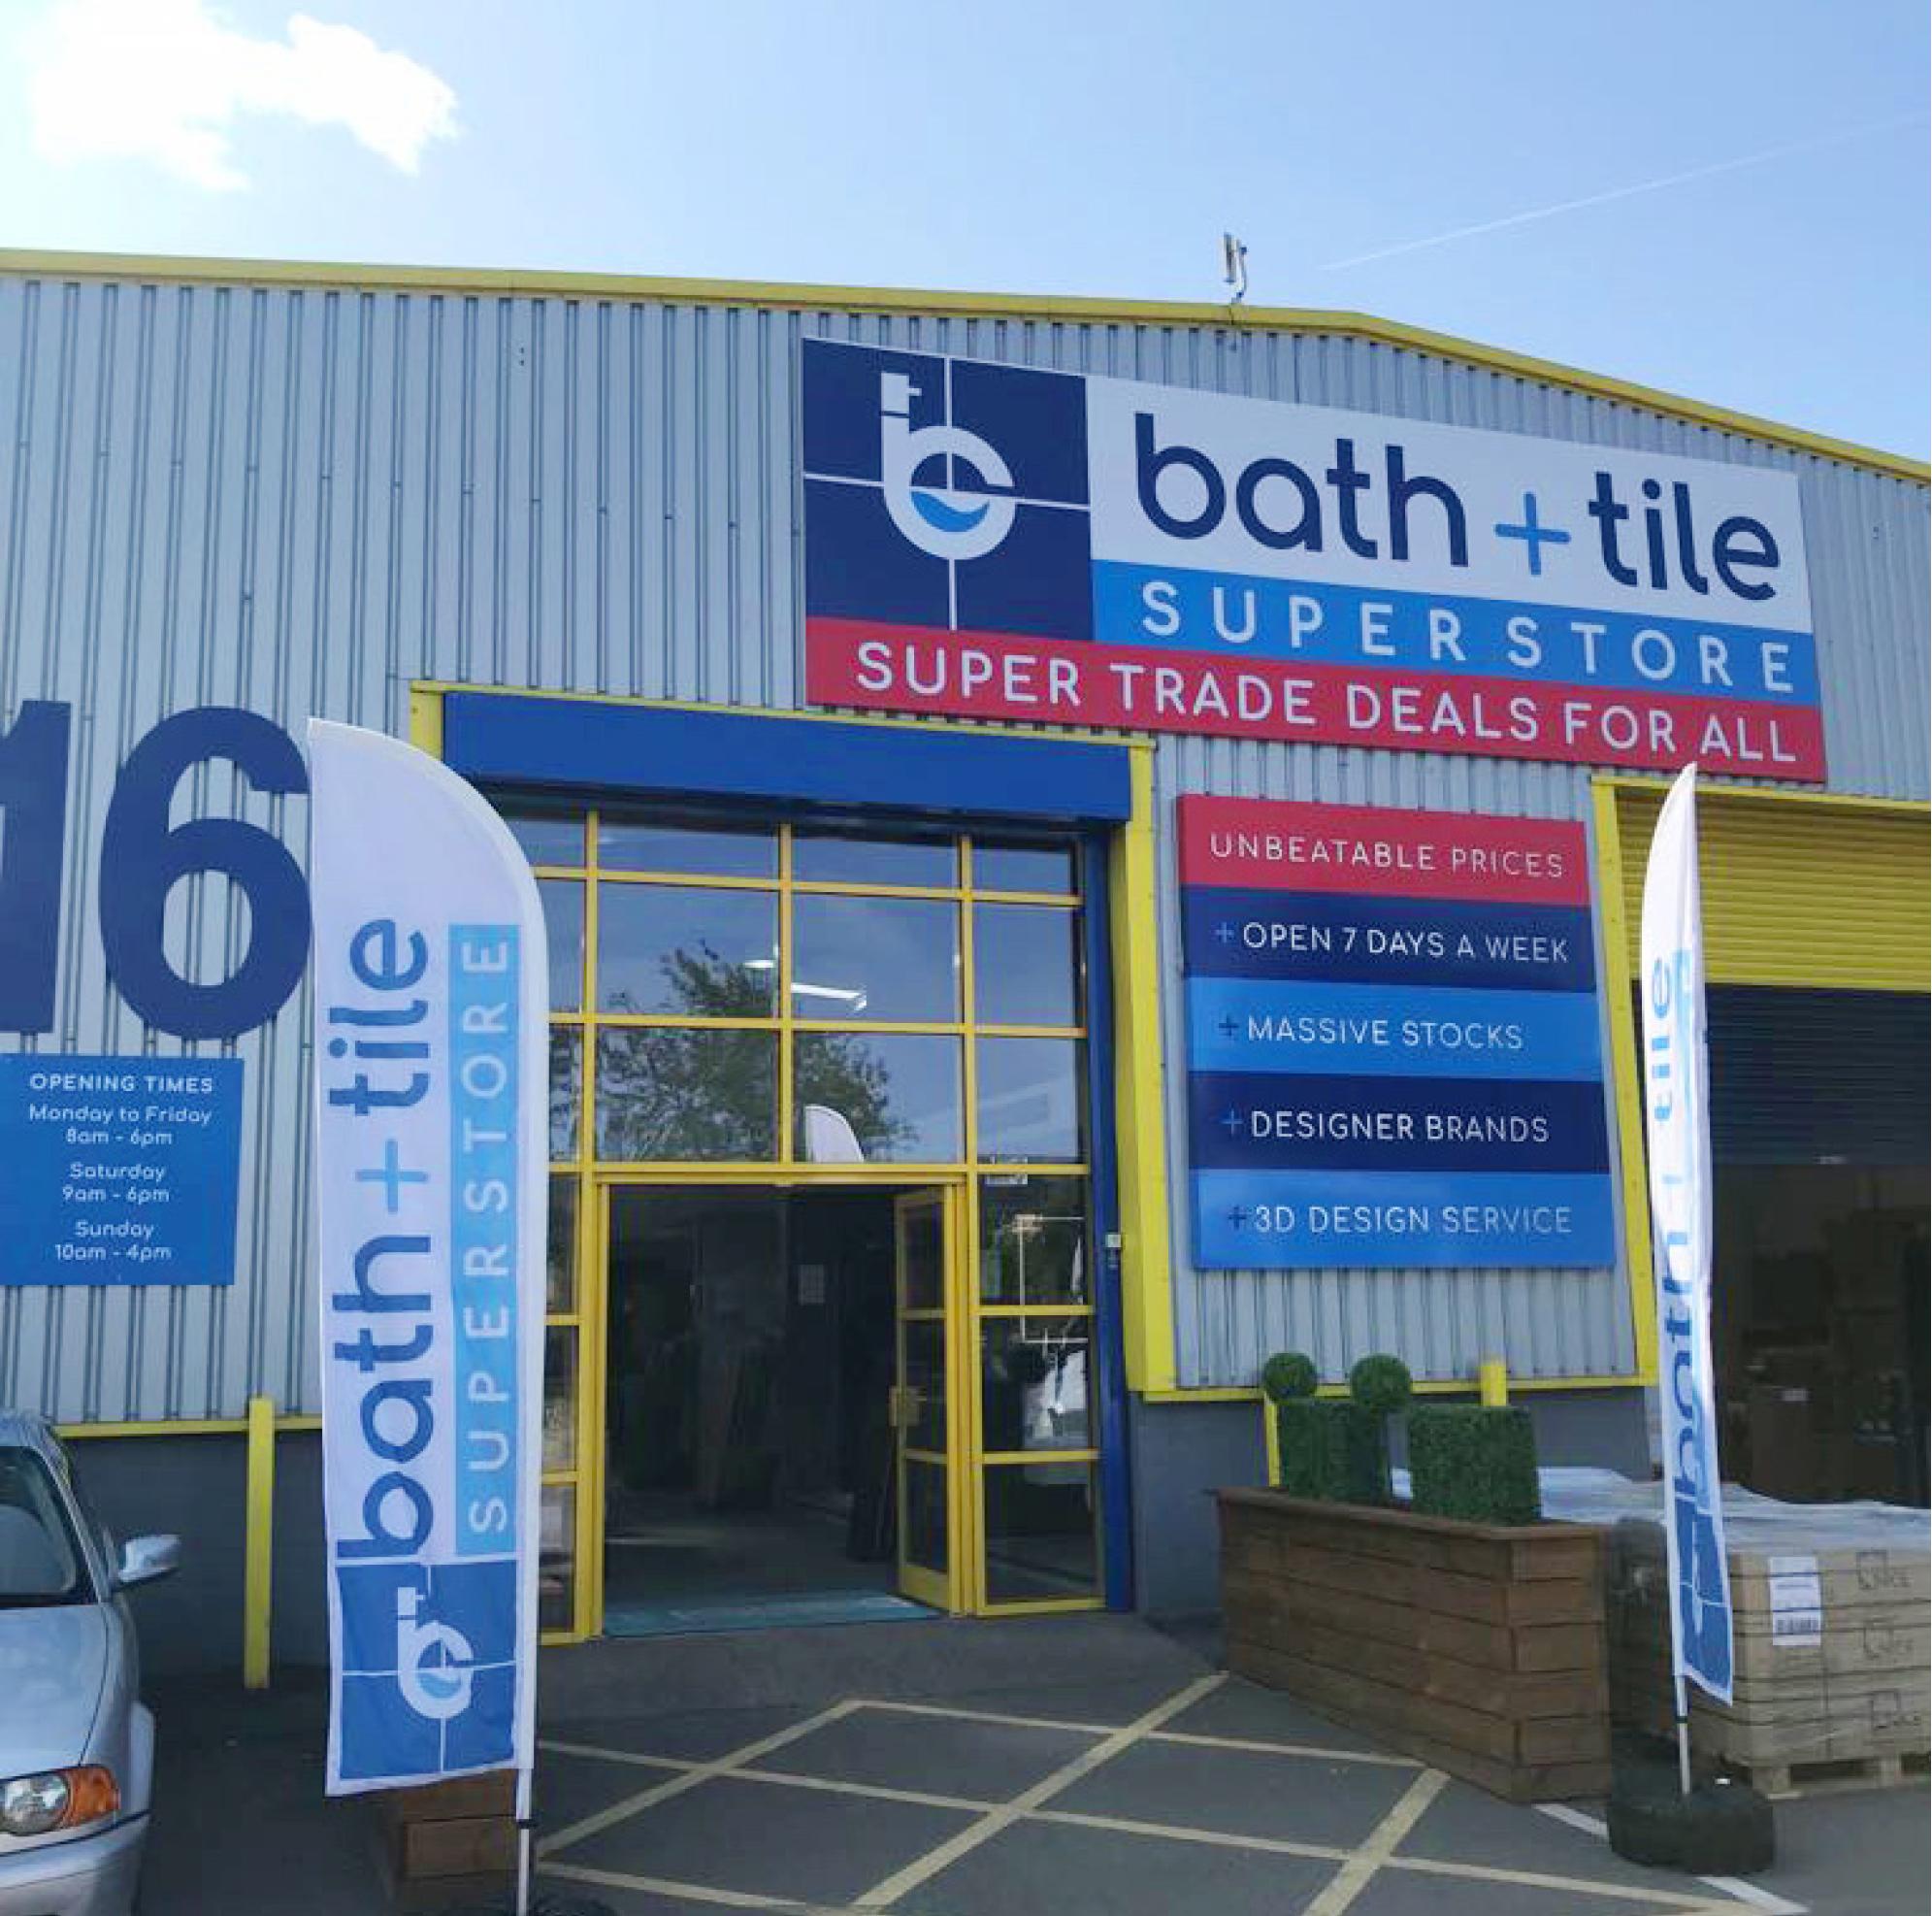 Bath+Tile Superstore